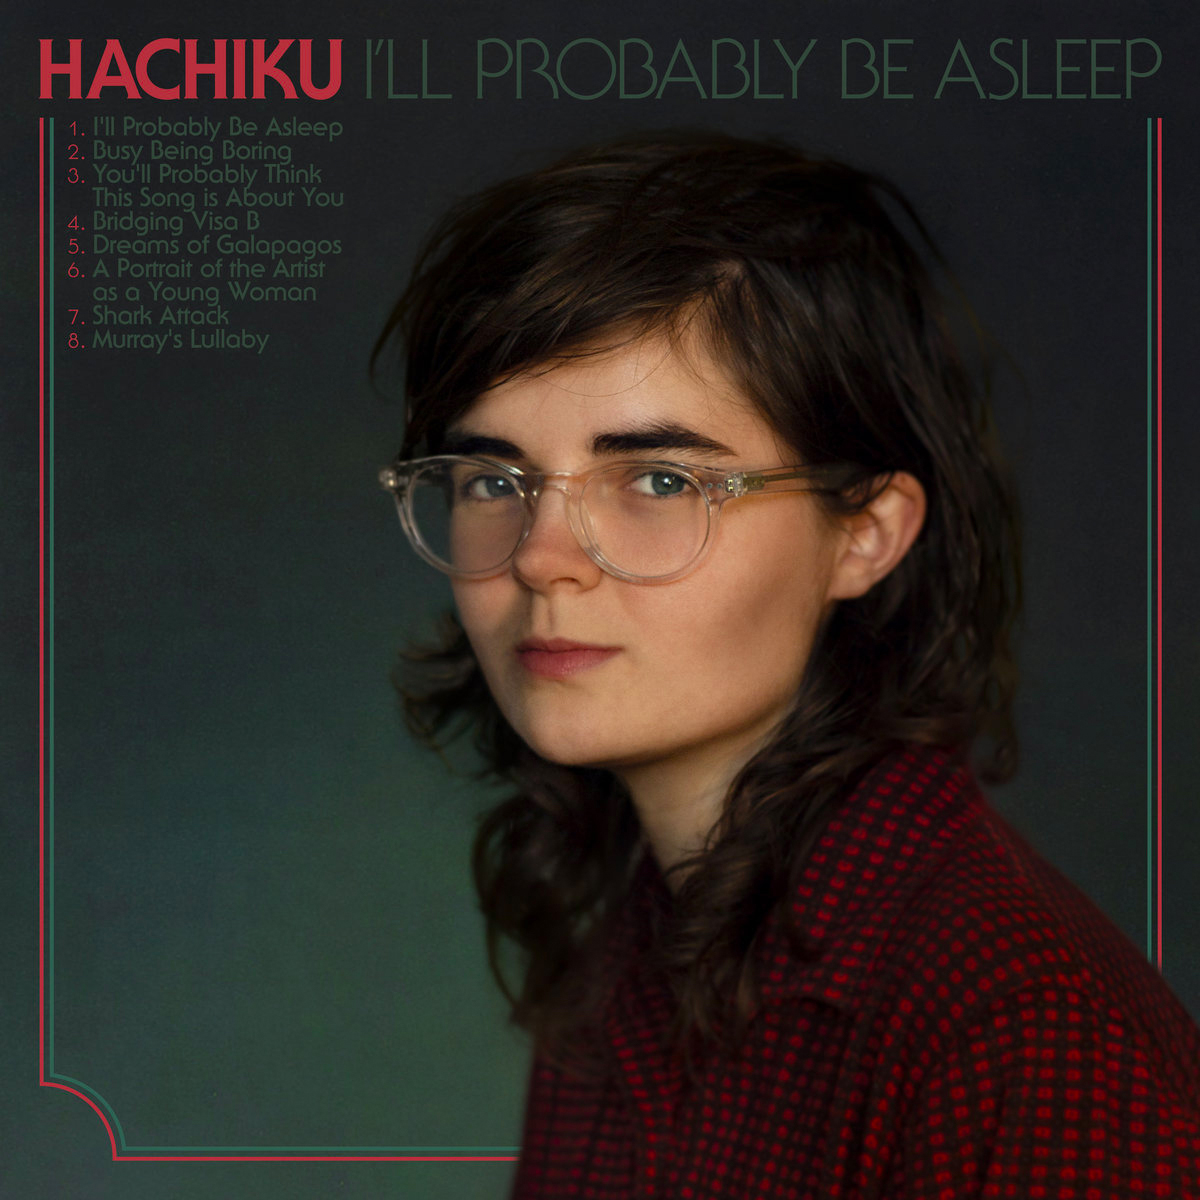 Hachiku Ill Probably Be Asleep new album Milk records